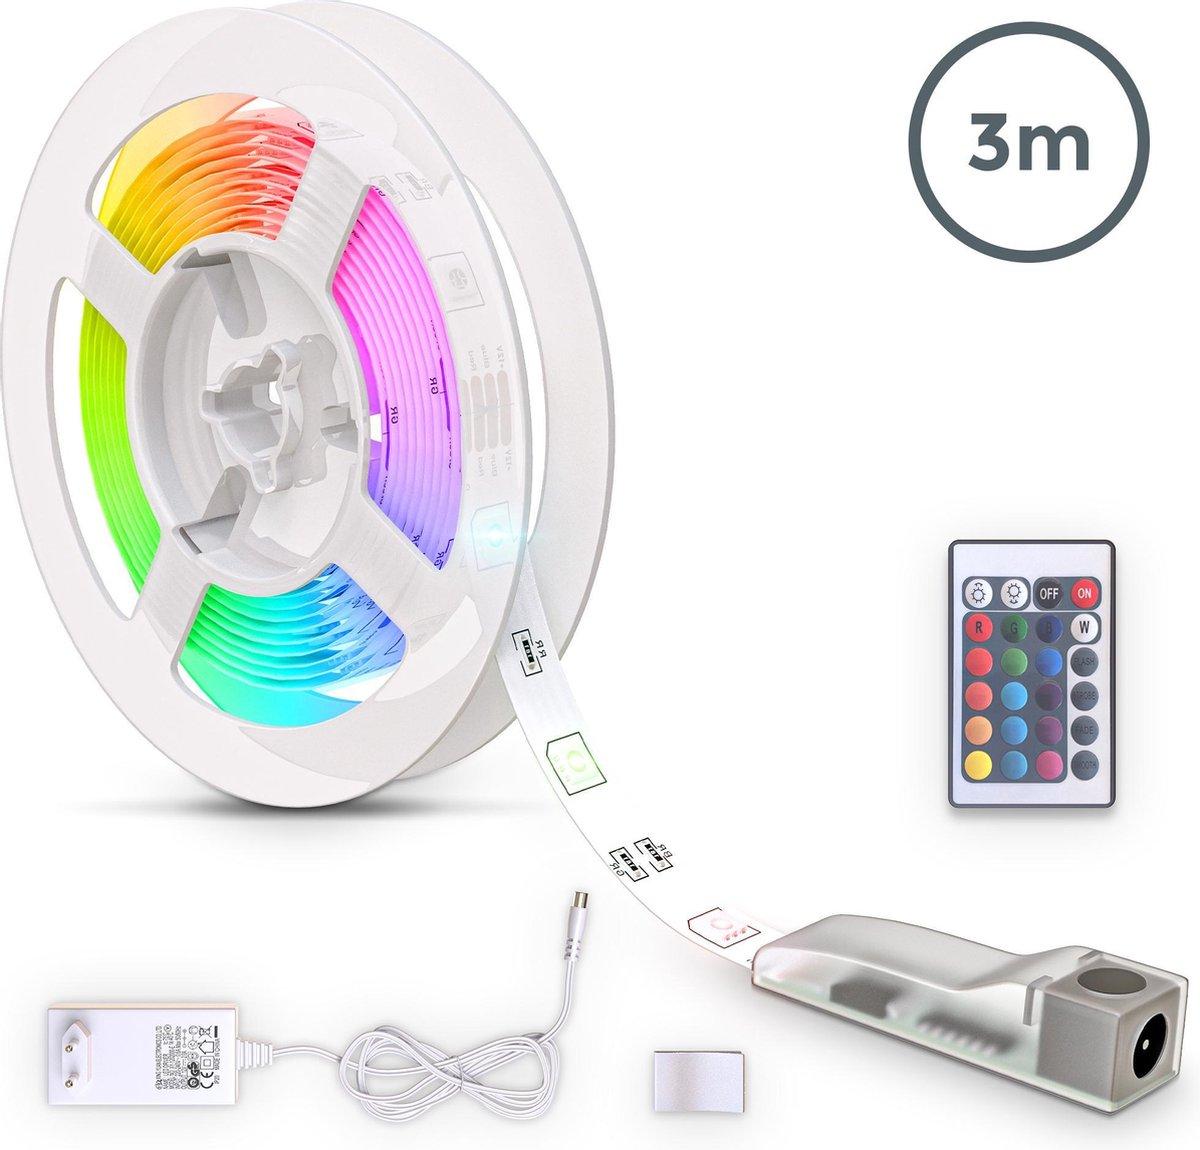 B.K.Licht - LED Strip - 3 meter - RGB kleurverandering - incl. afstandsbediening - zelfklevend